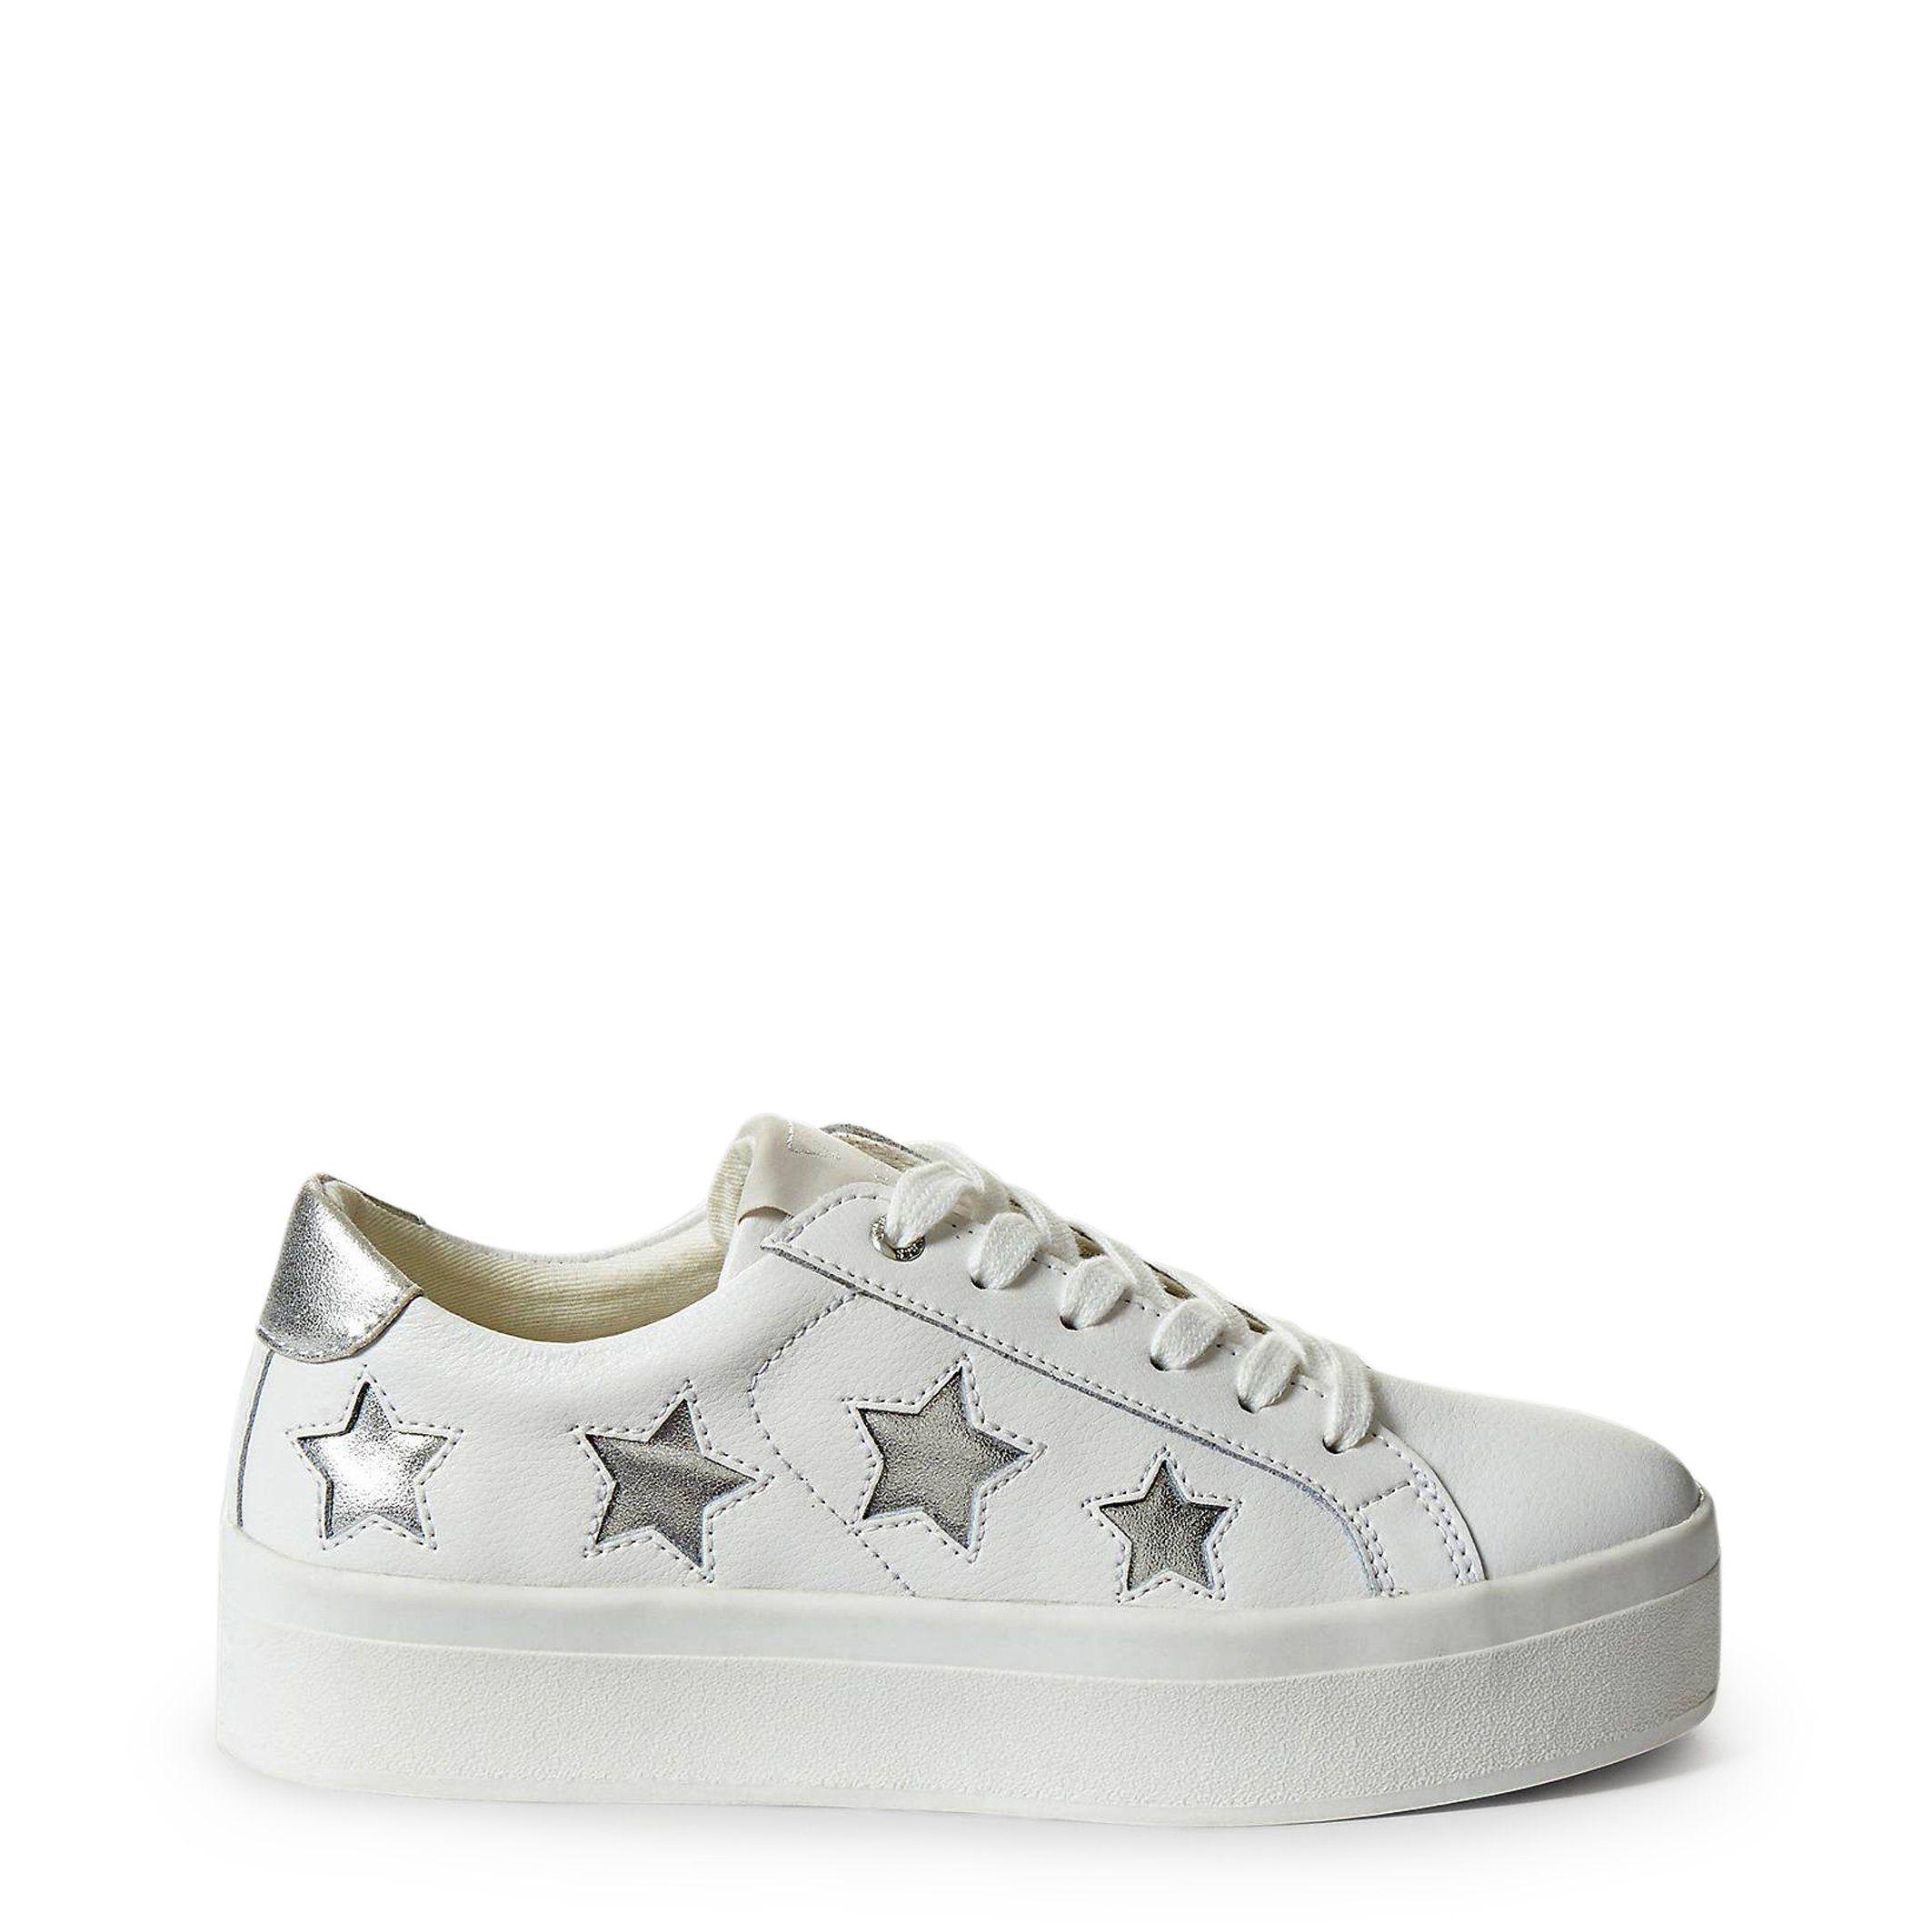 FLFHS3LEA12 | Guess shoes sneakers